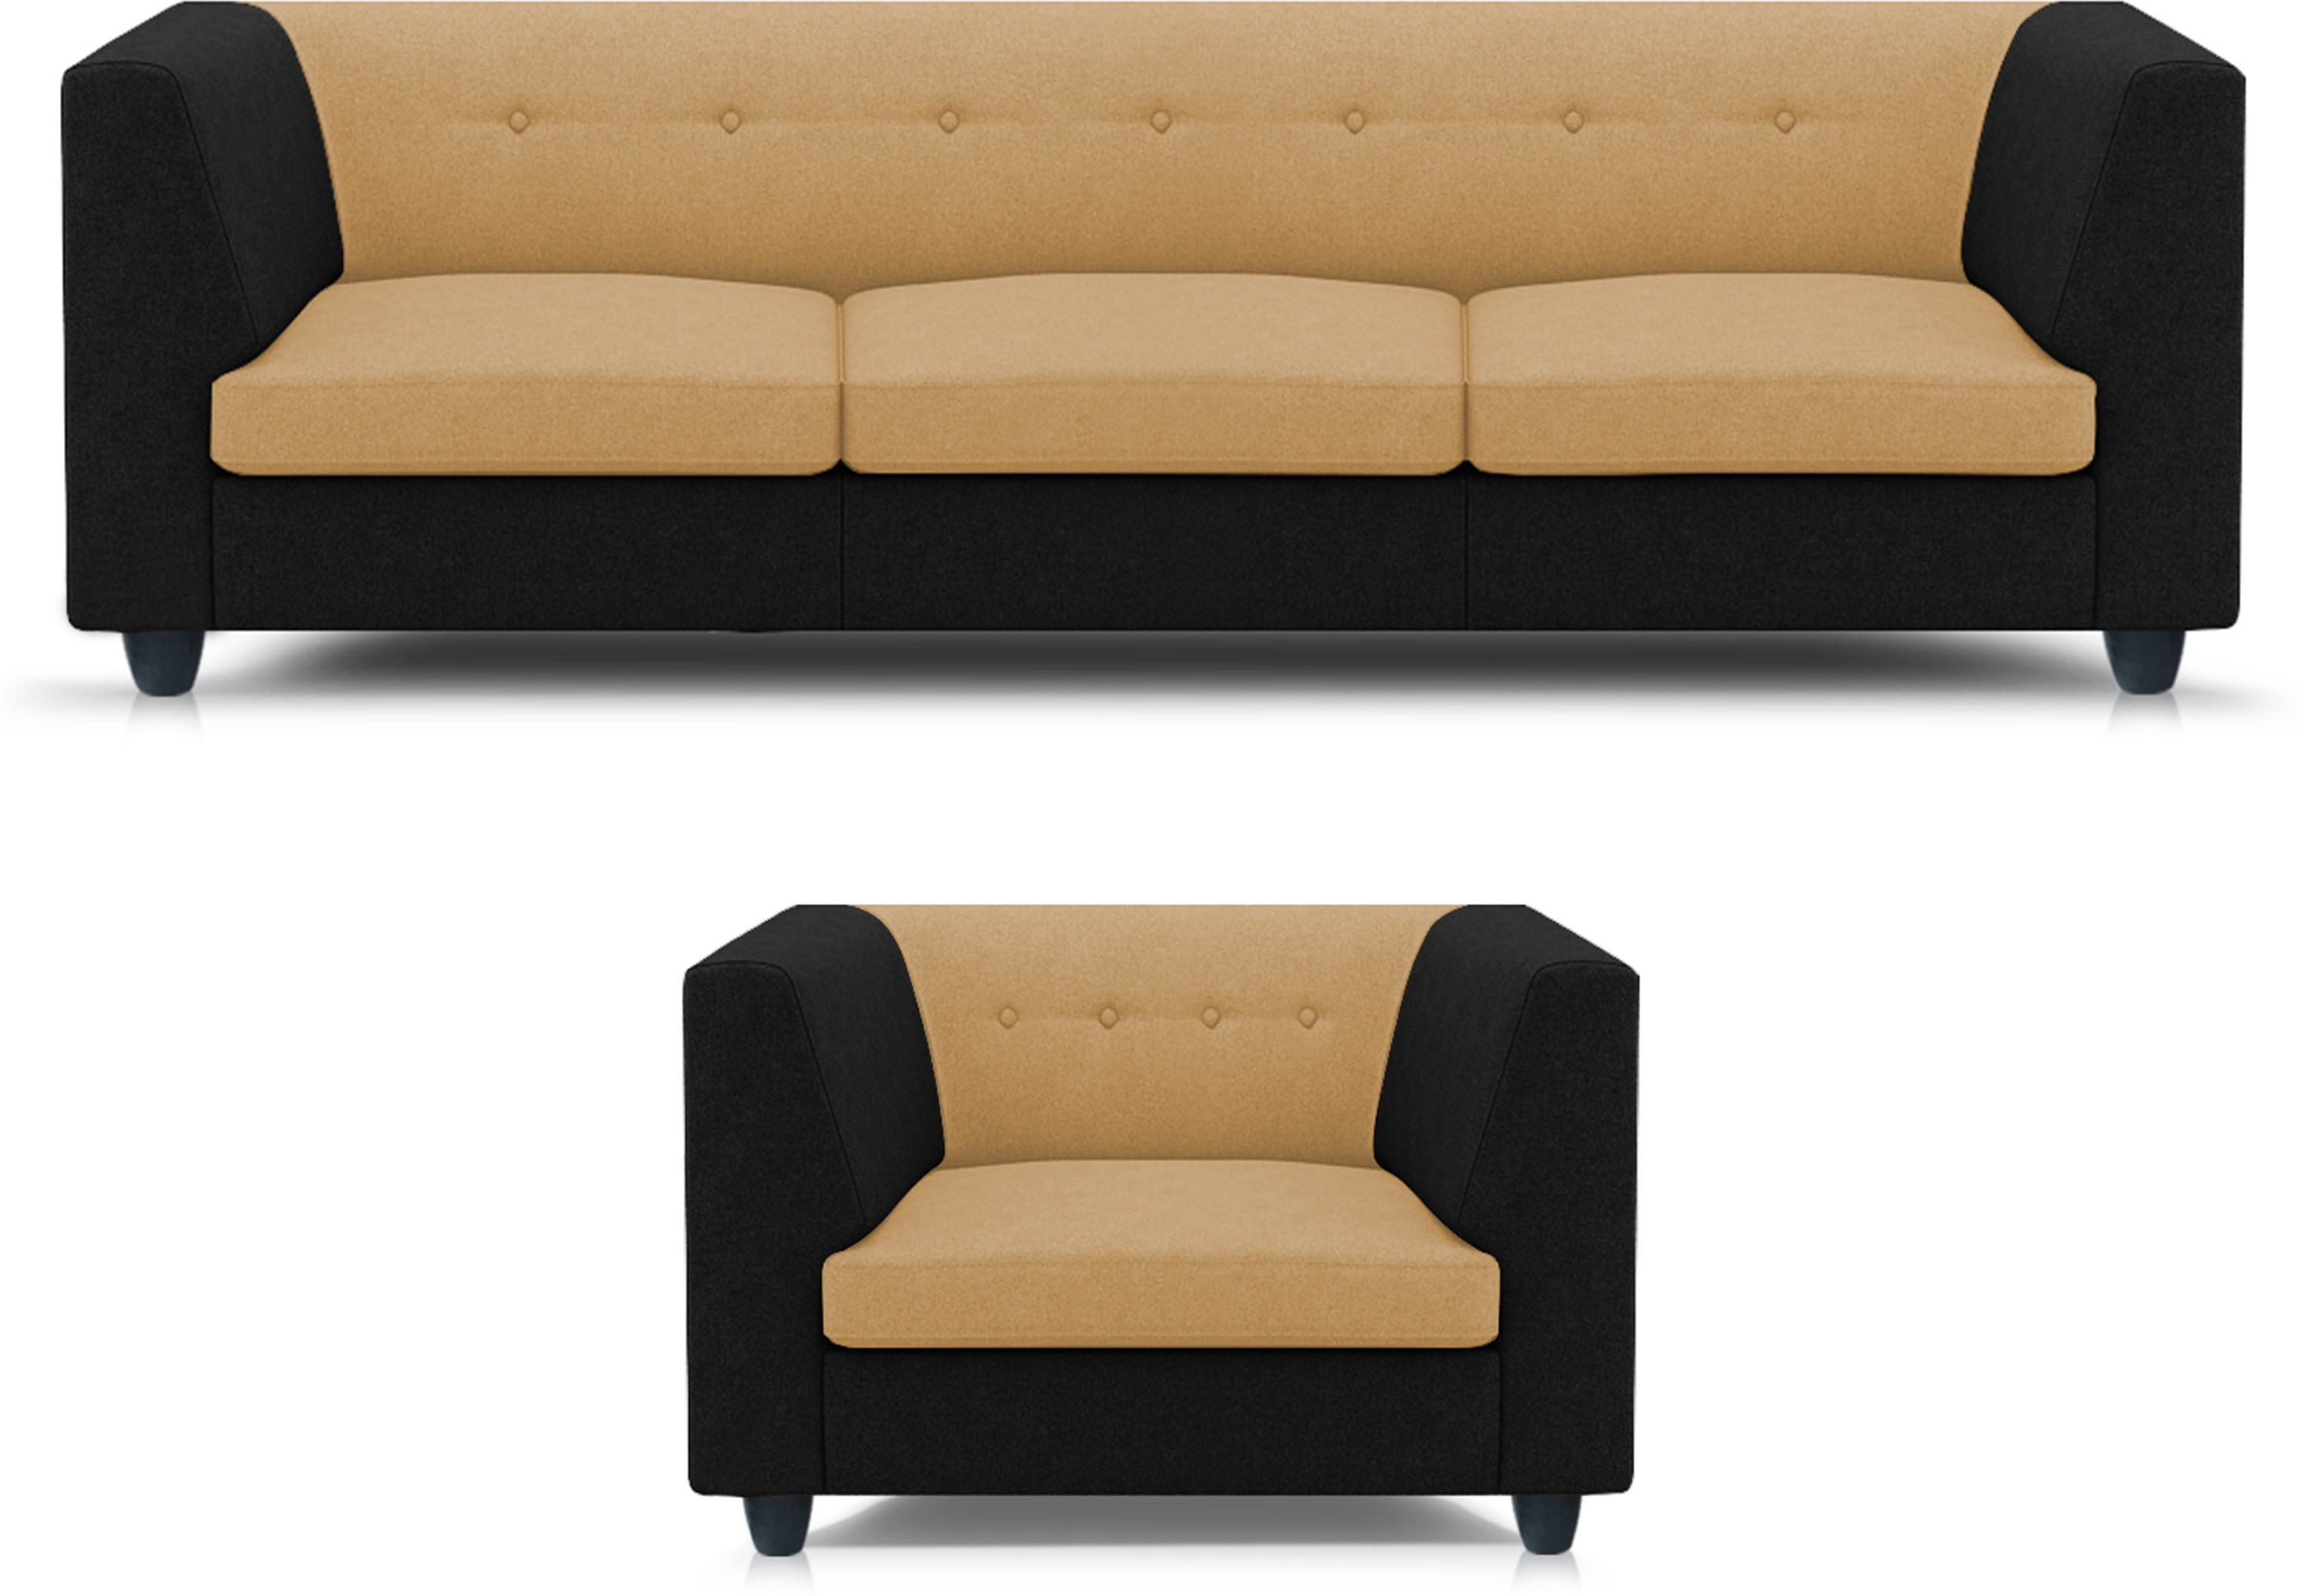 View Adorn homez Modern Solid Wood 3 + 1 Multi Sofa Set Furniture (Adorn homez)